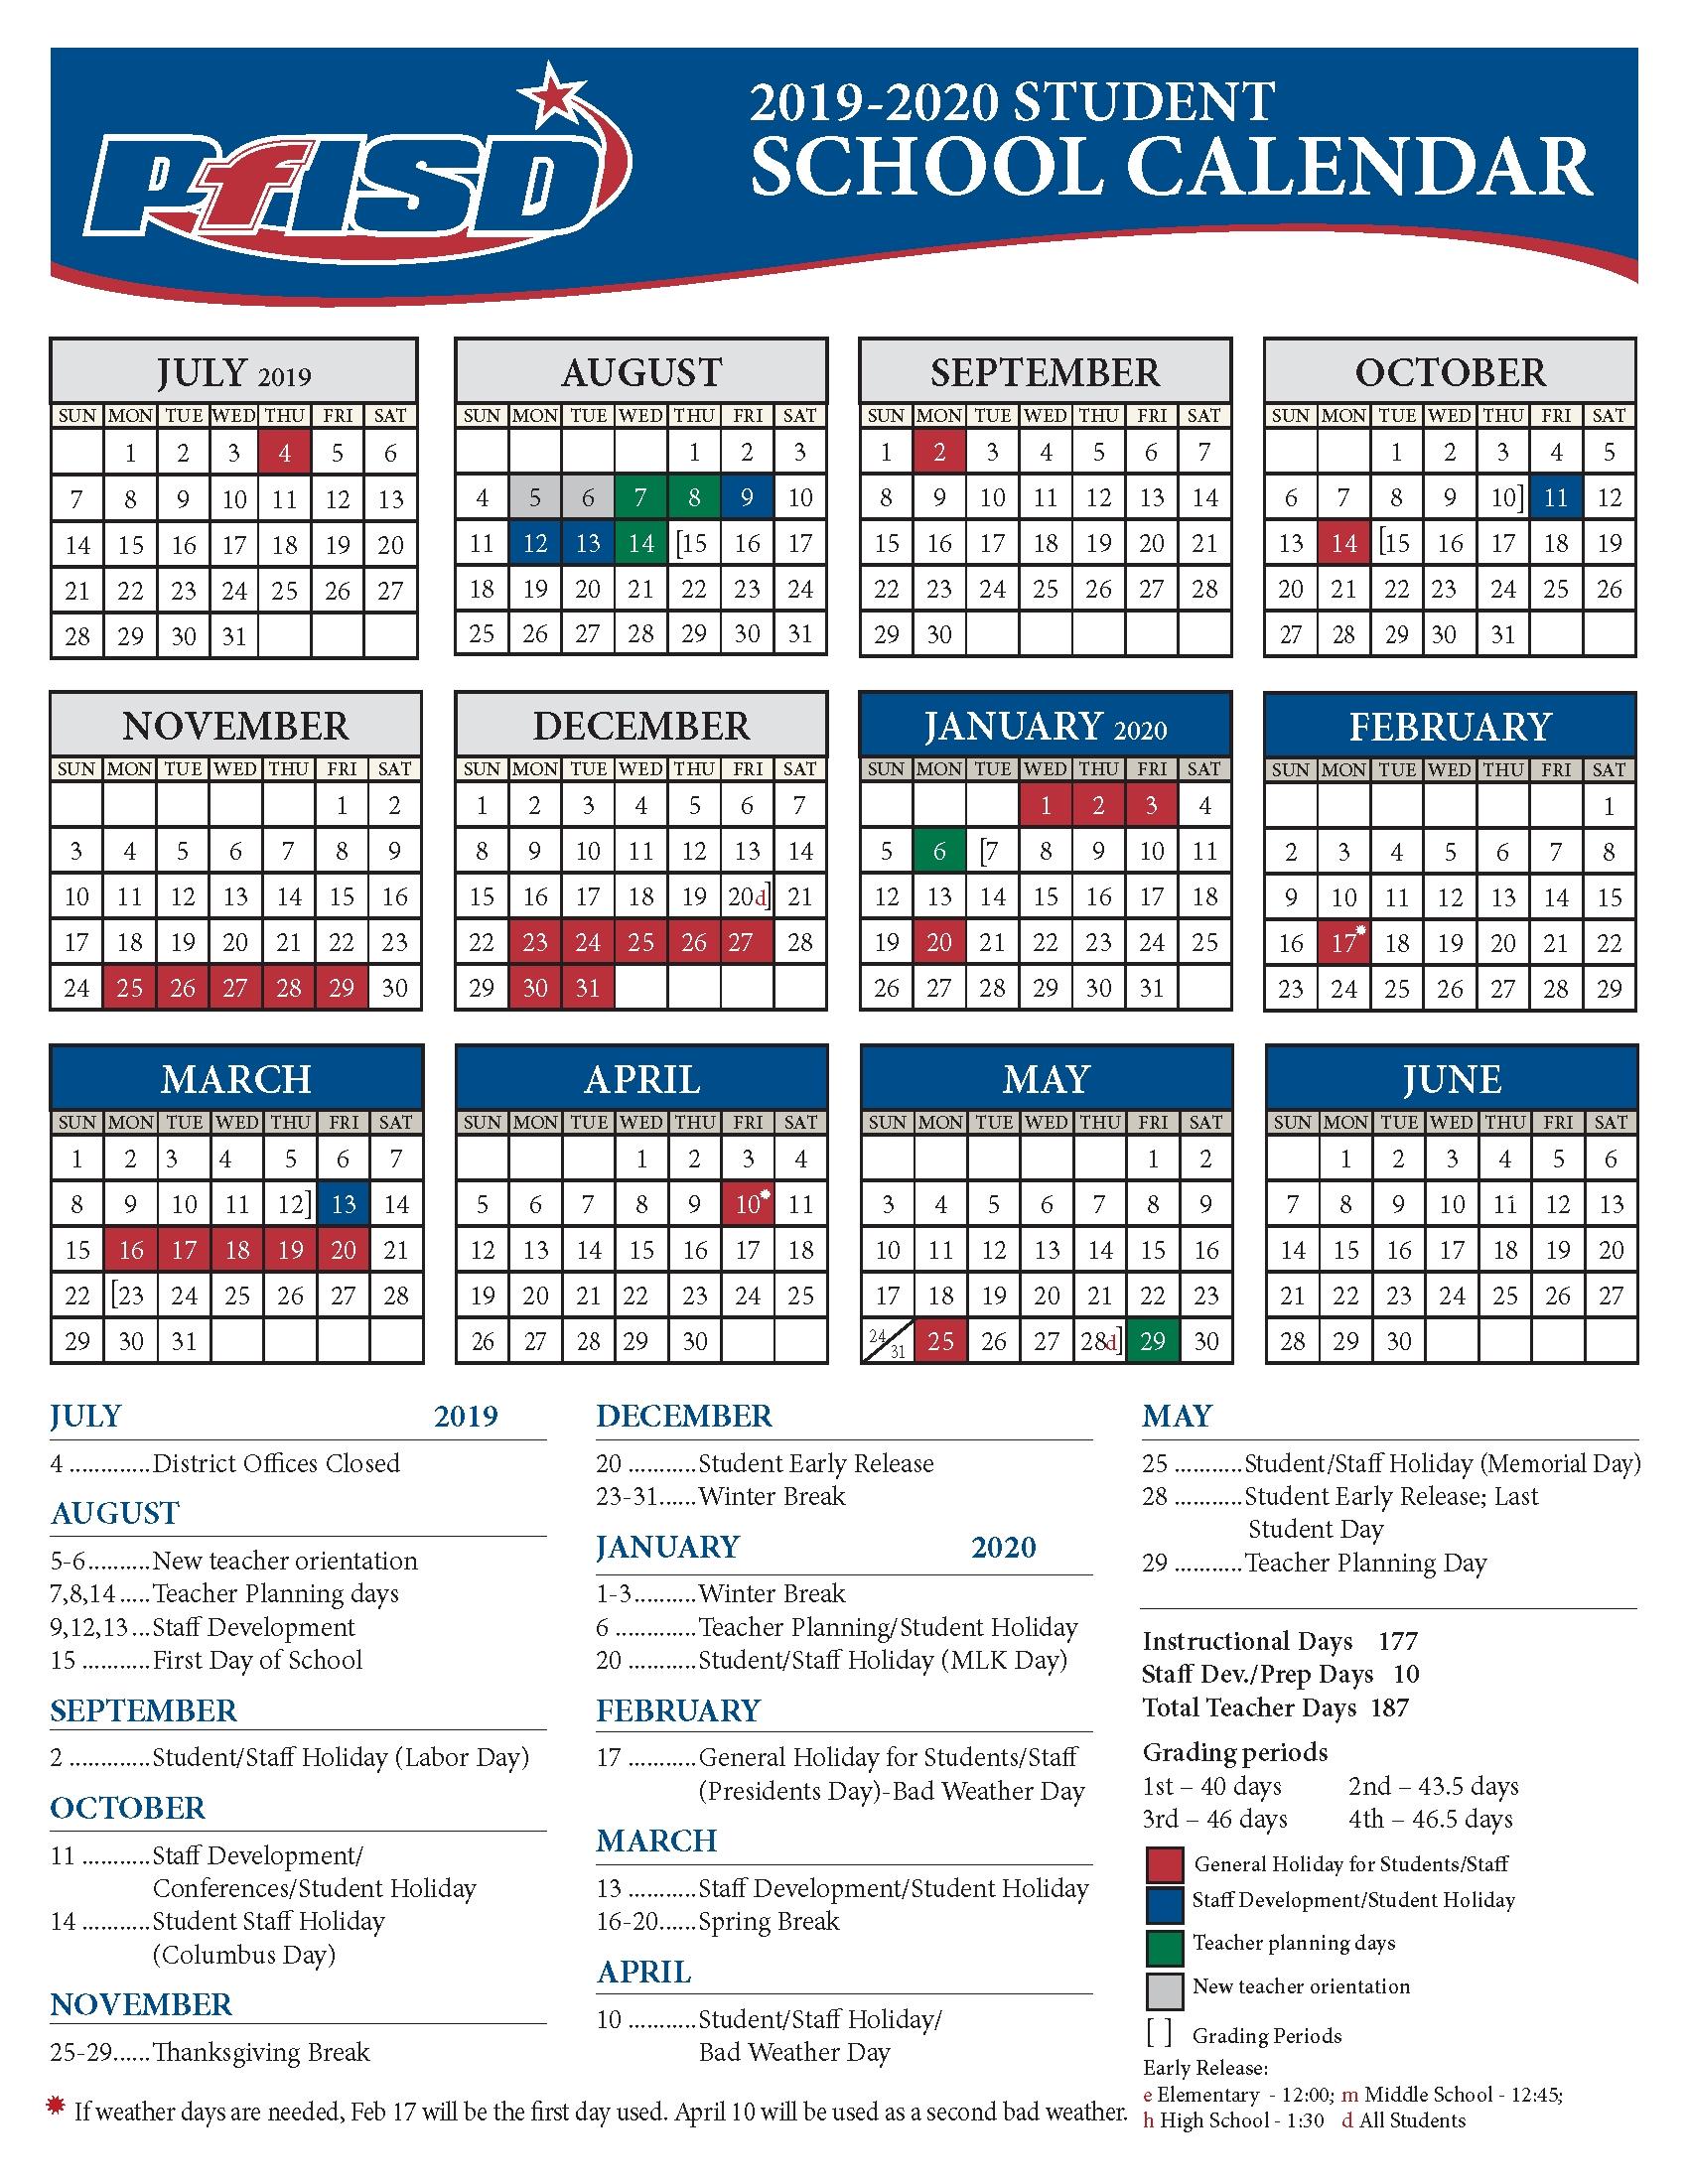 School Year Calendar / 2019-2020 District Calendar Perky 2020 Calendar School Holidays